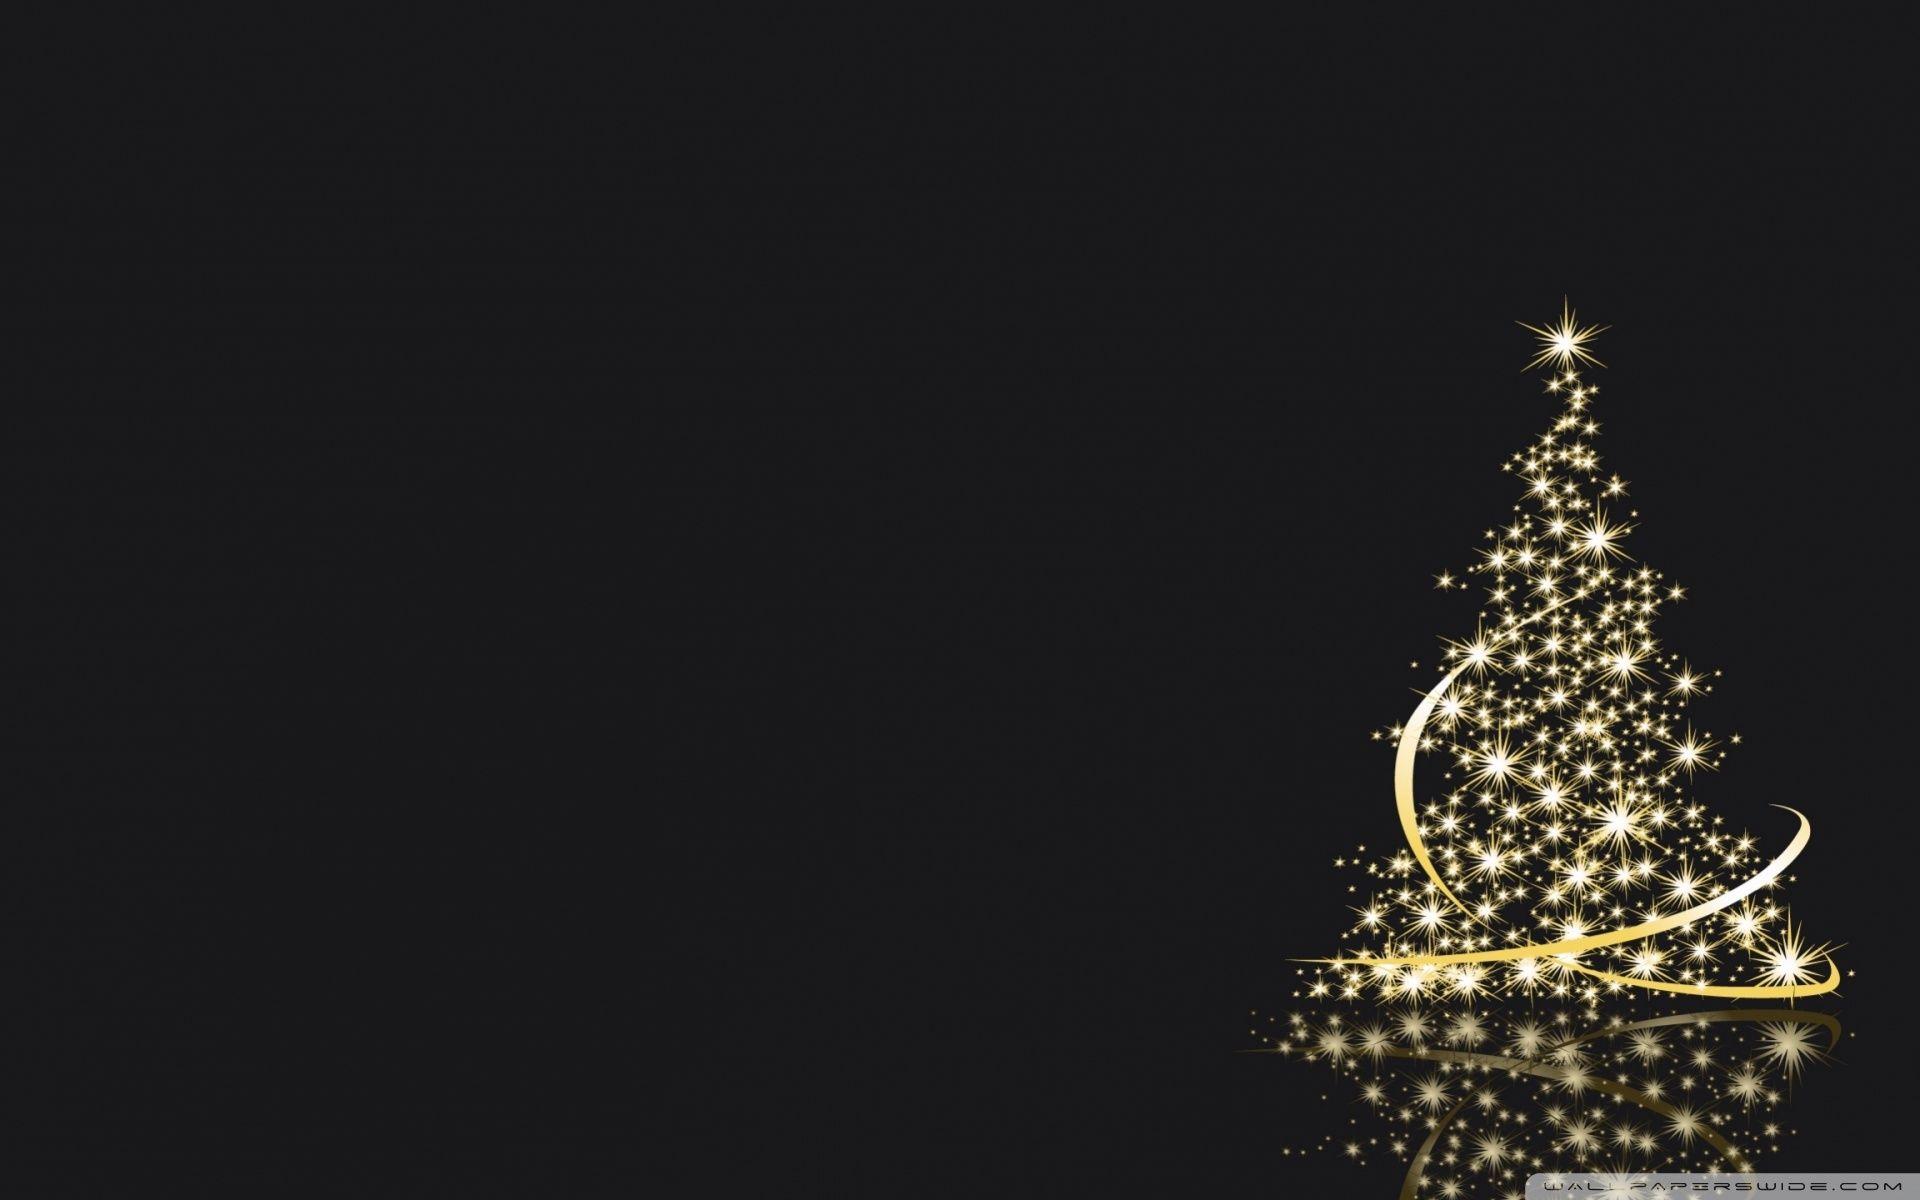 Top 10 Free Christmas Wallpapers For Ubuntu Desktop